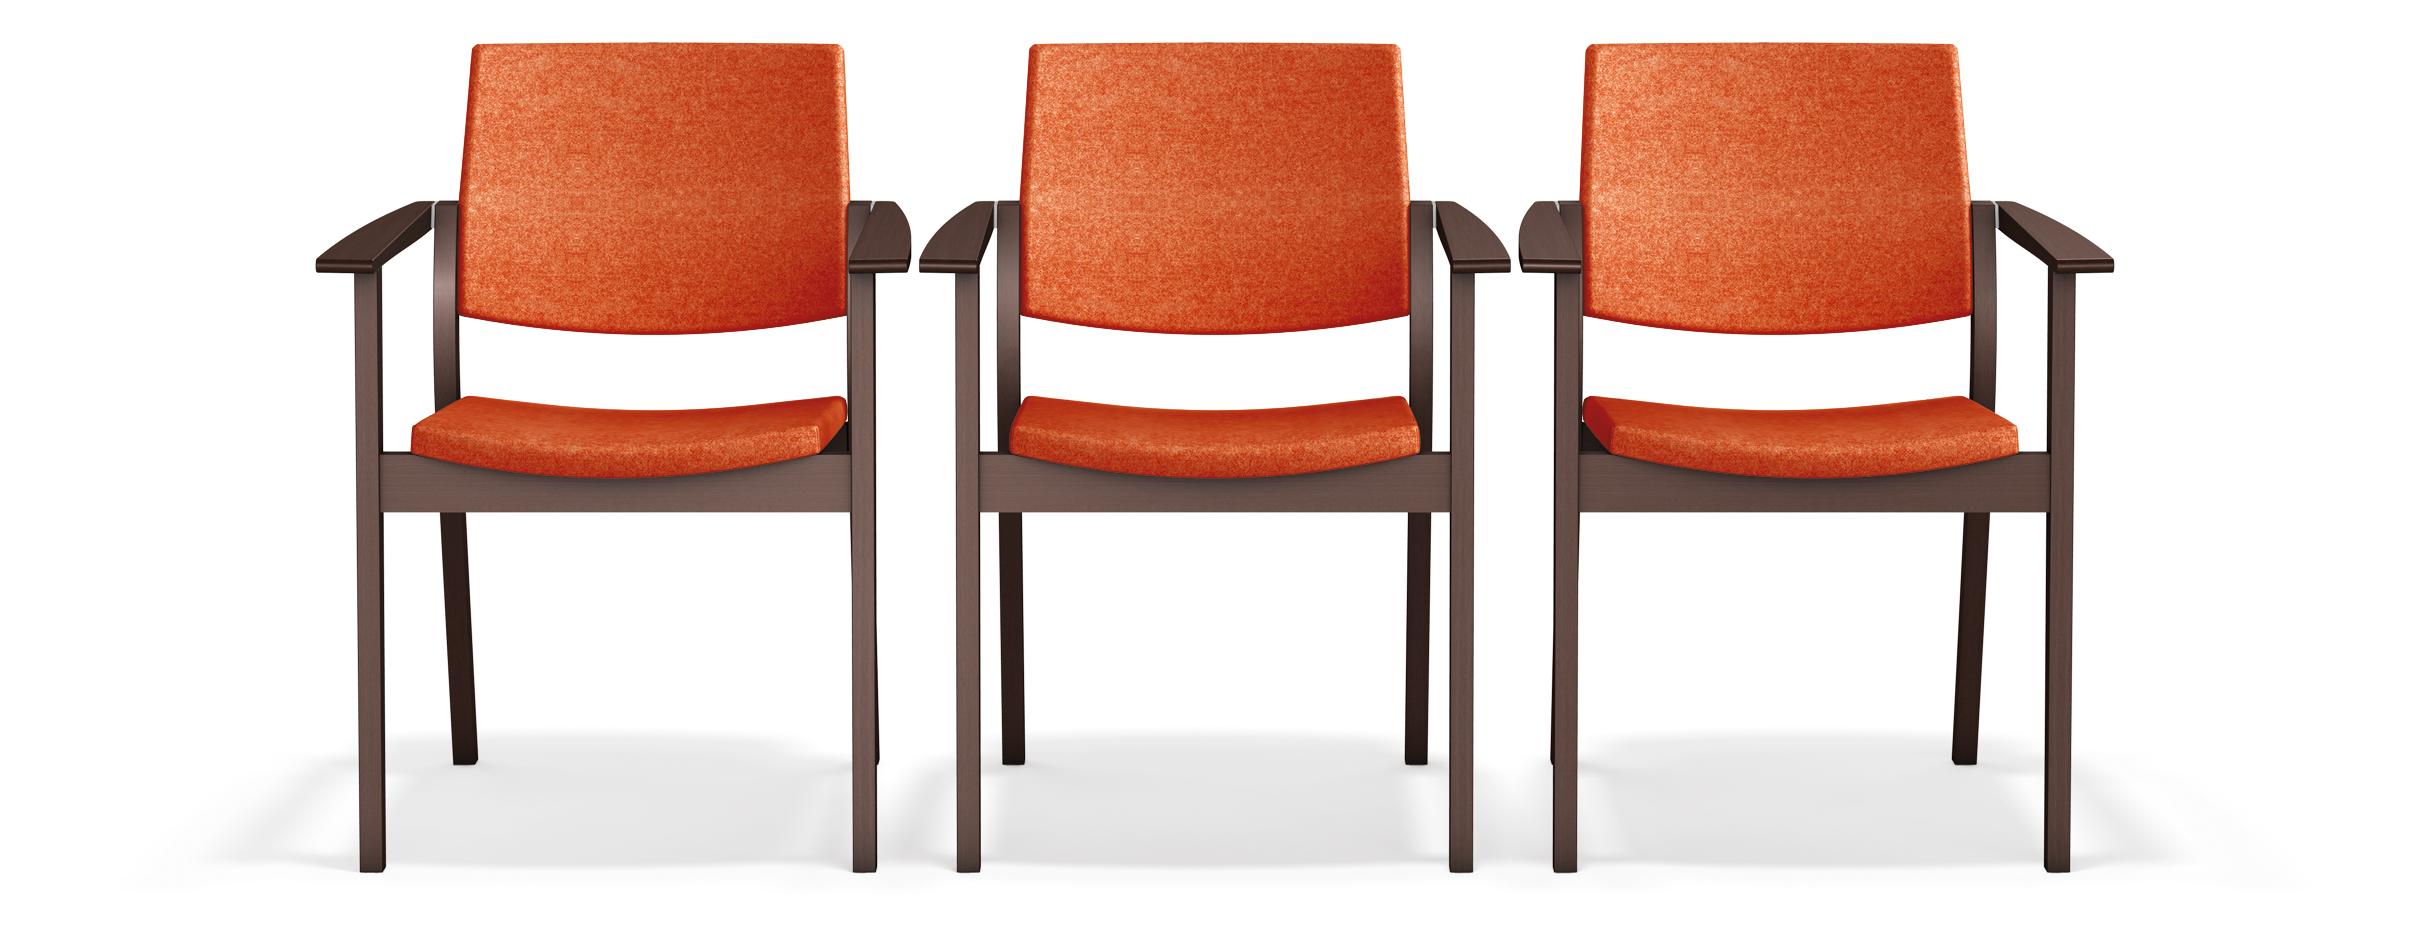 Casala Sina stoelen